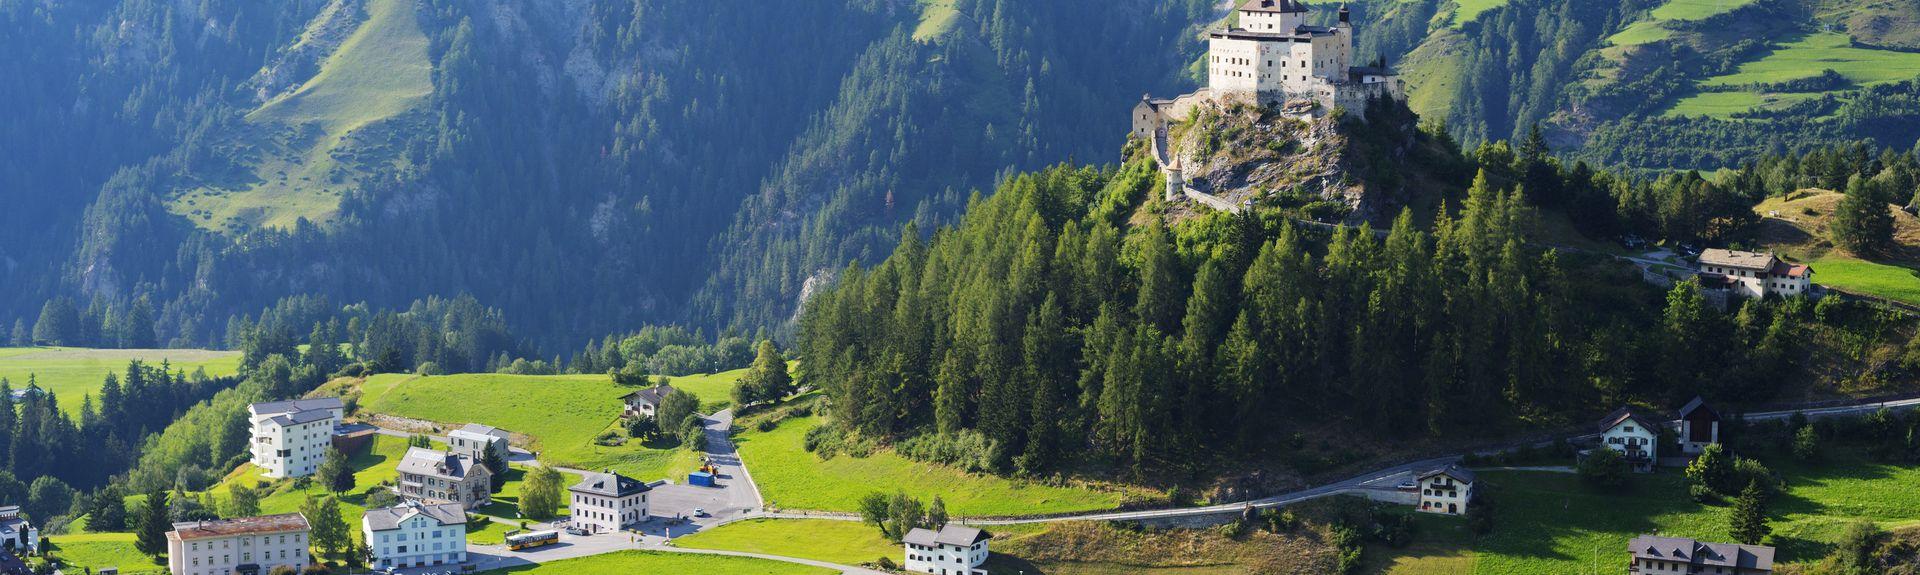 Scuol, Grisons, Suisse